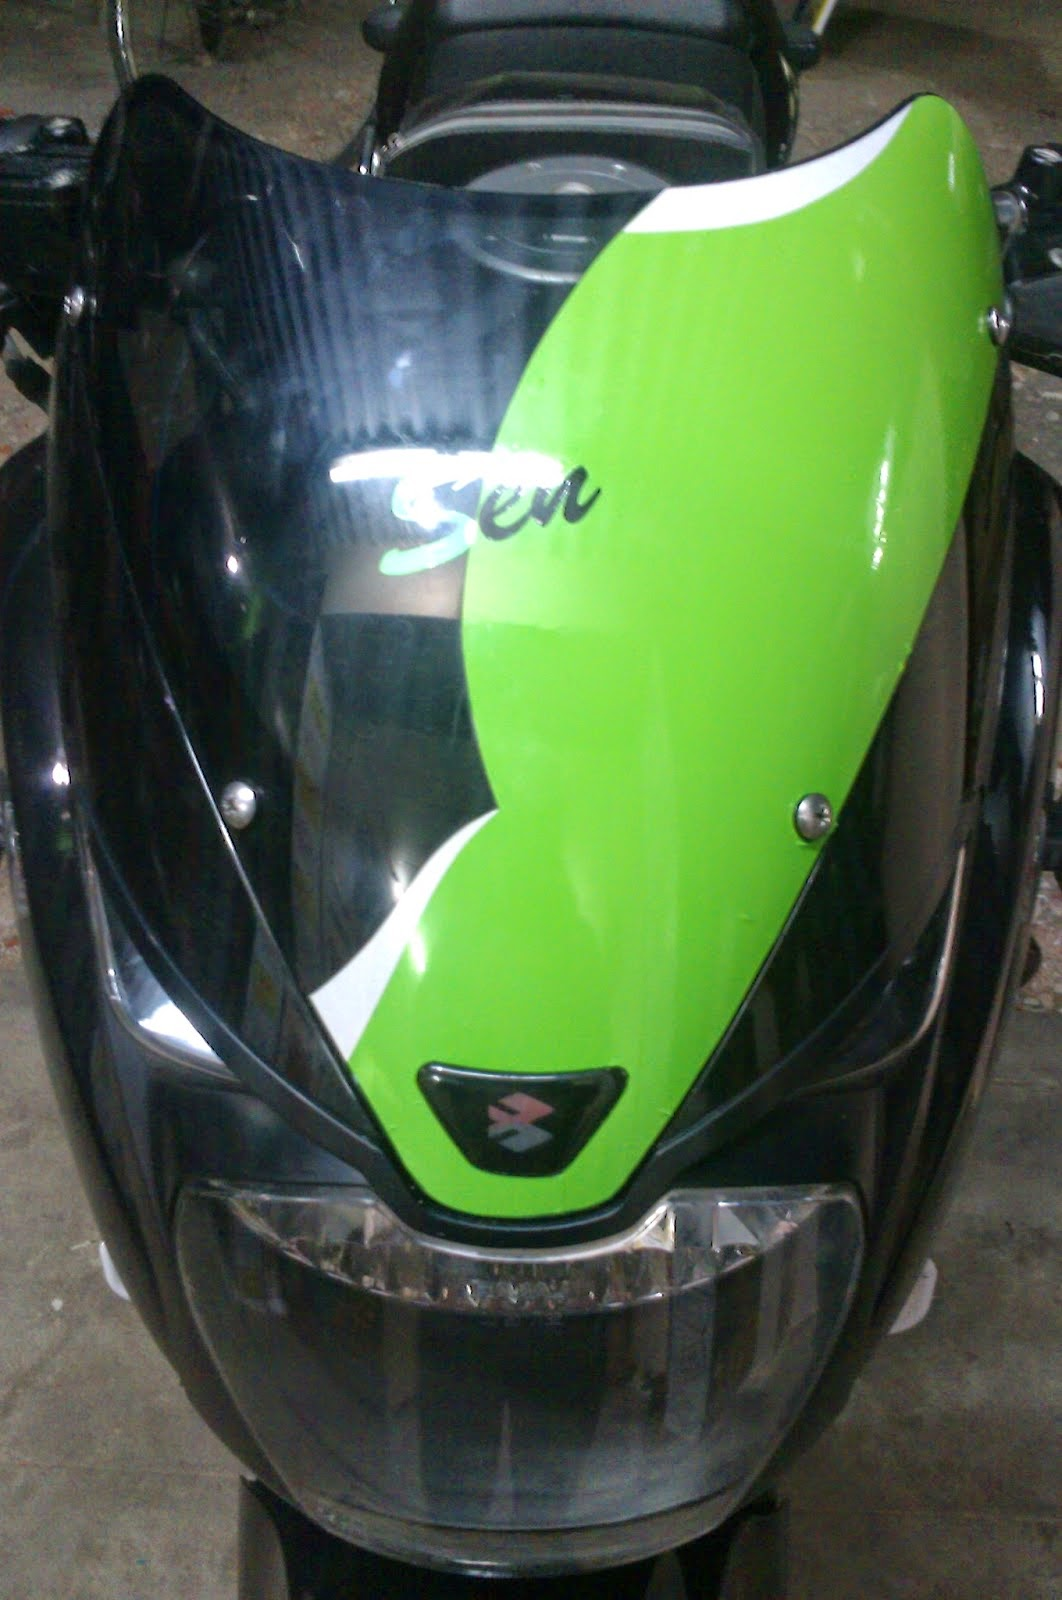 Bike stickers design online india - Bike Visor Stickers Design Raja Stickers Salem Mettur Dam 1 Tamil Nadu India